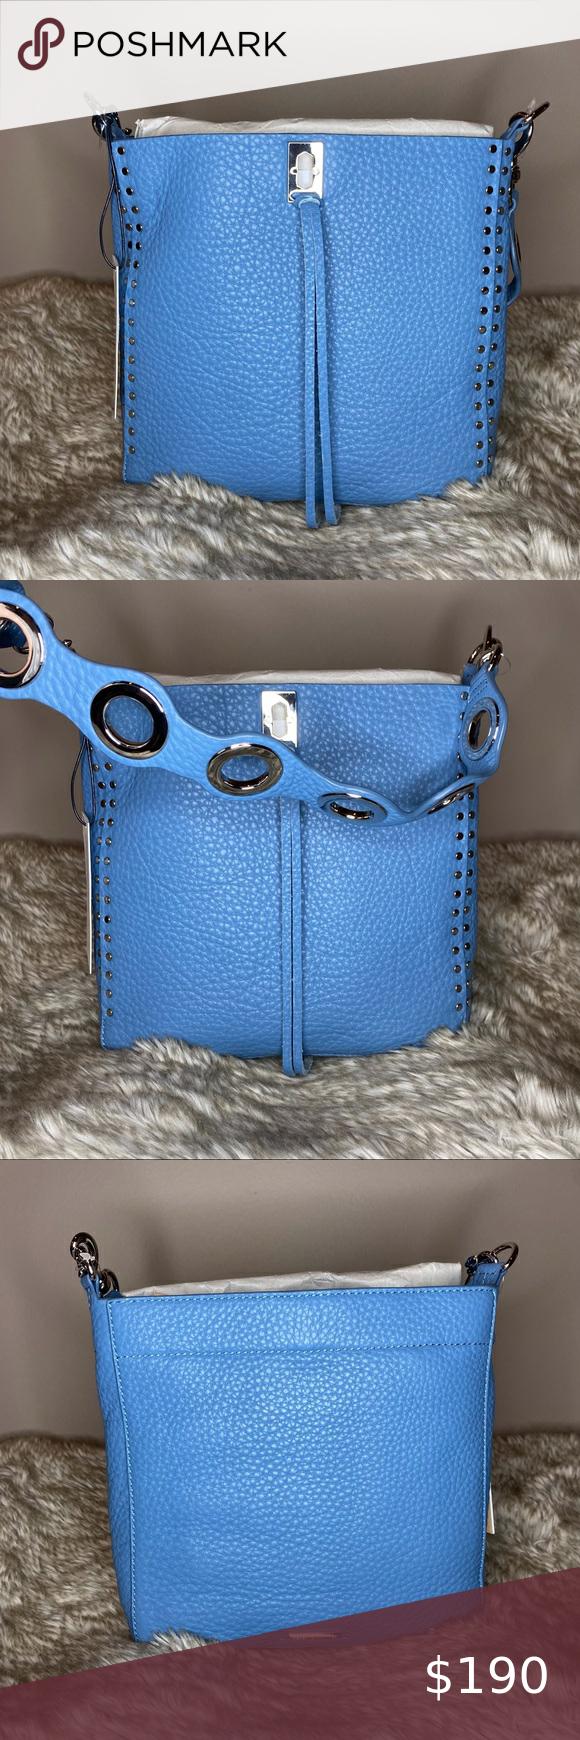 Rehard grey leather bag   REFLECTONLINE.COM   Grey leather